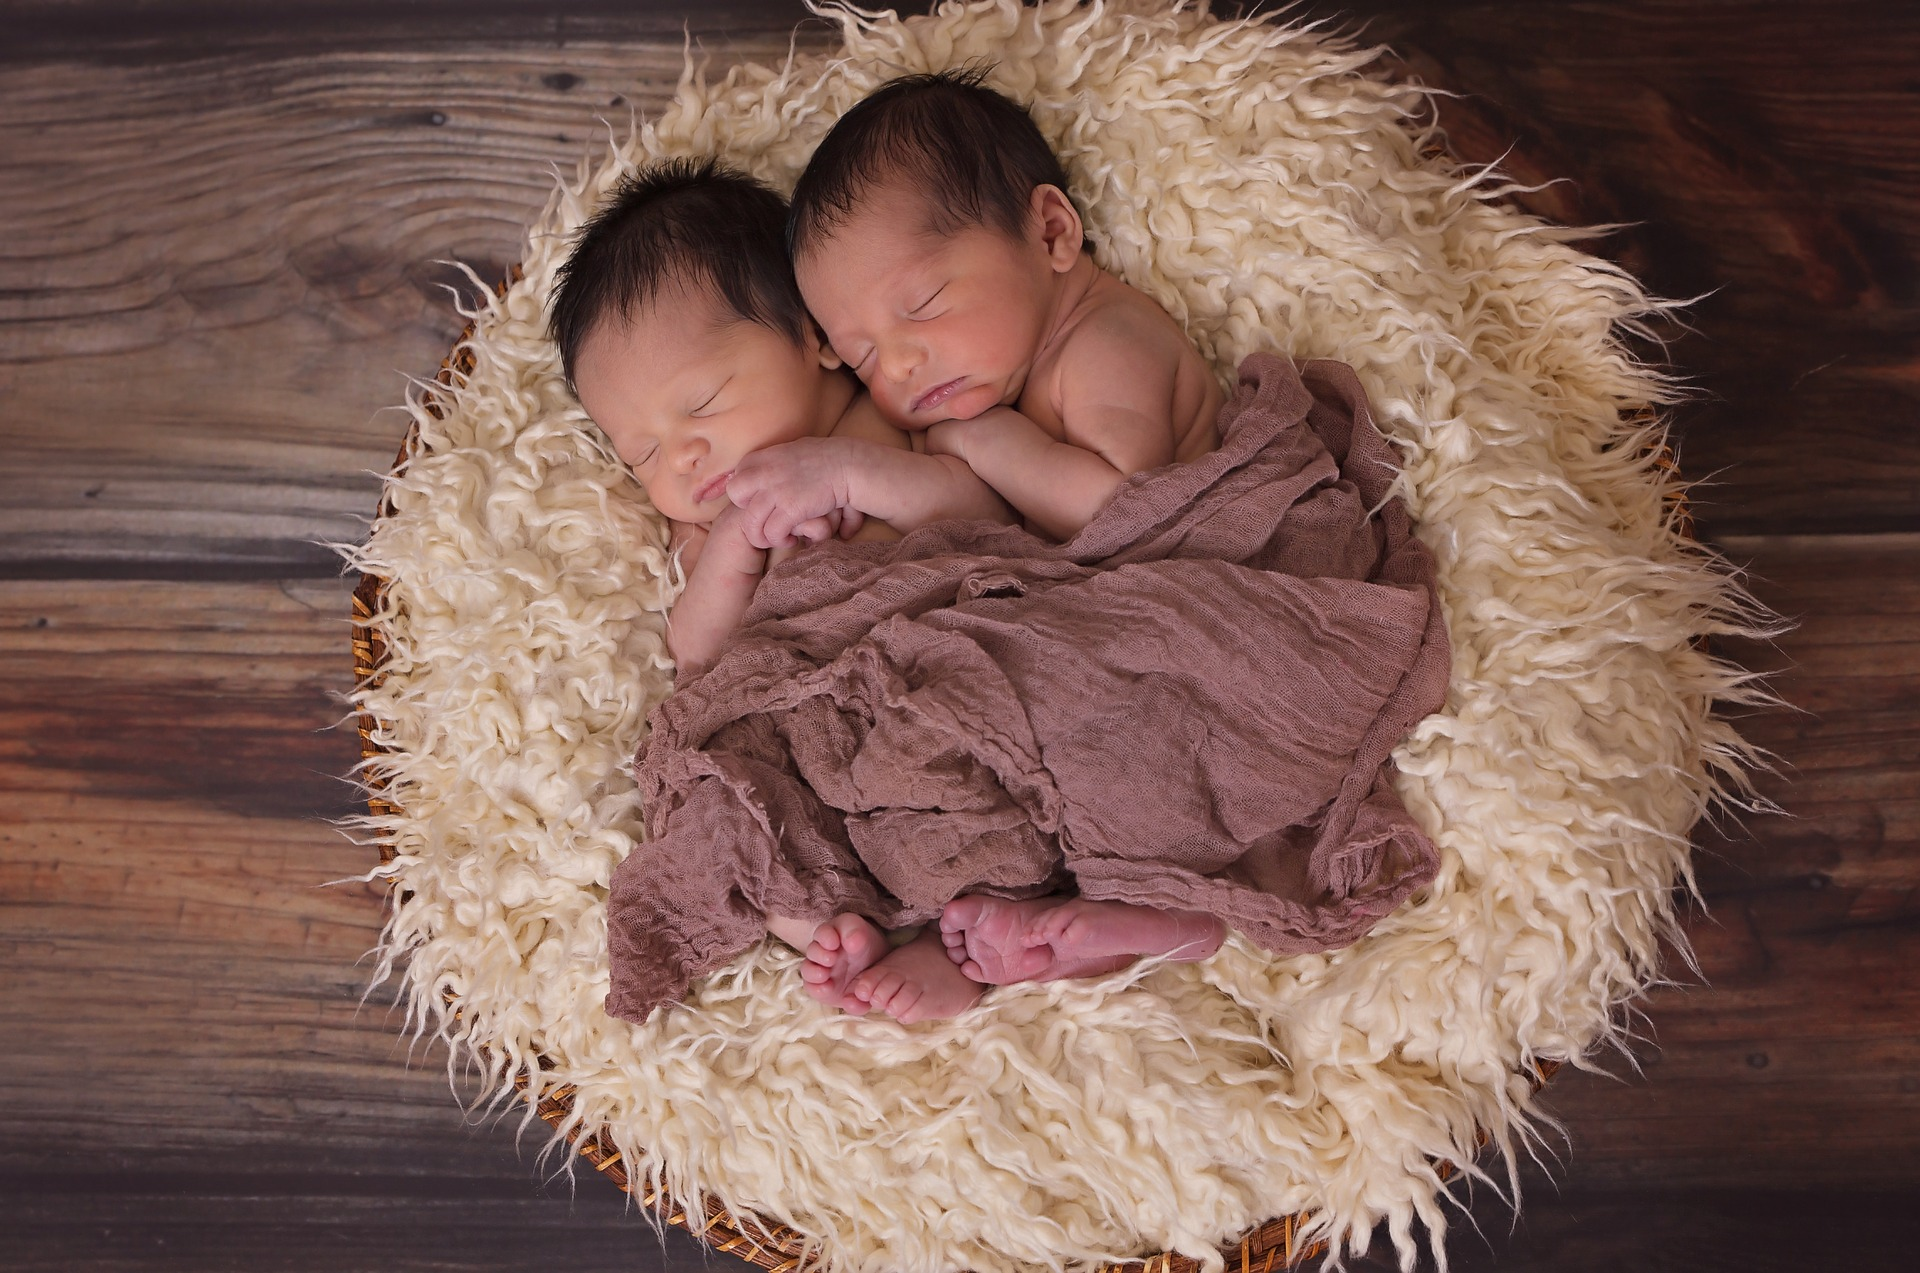 twins-1628843_1920-2.jpg